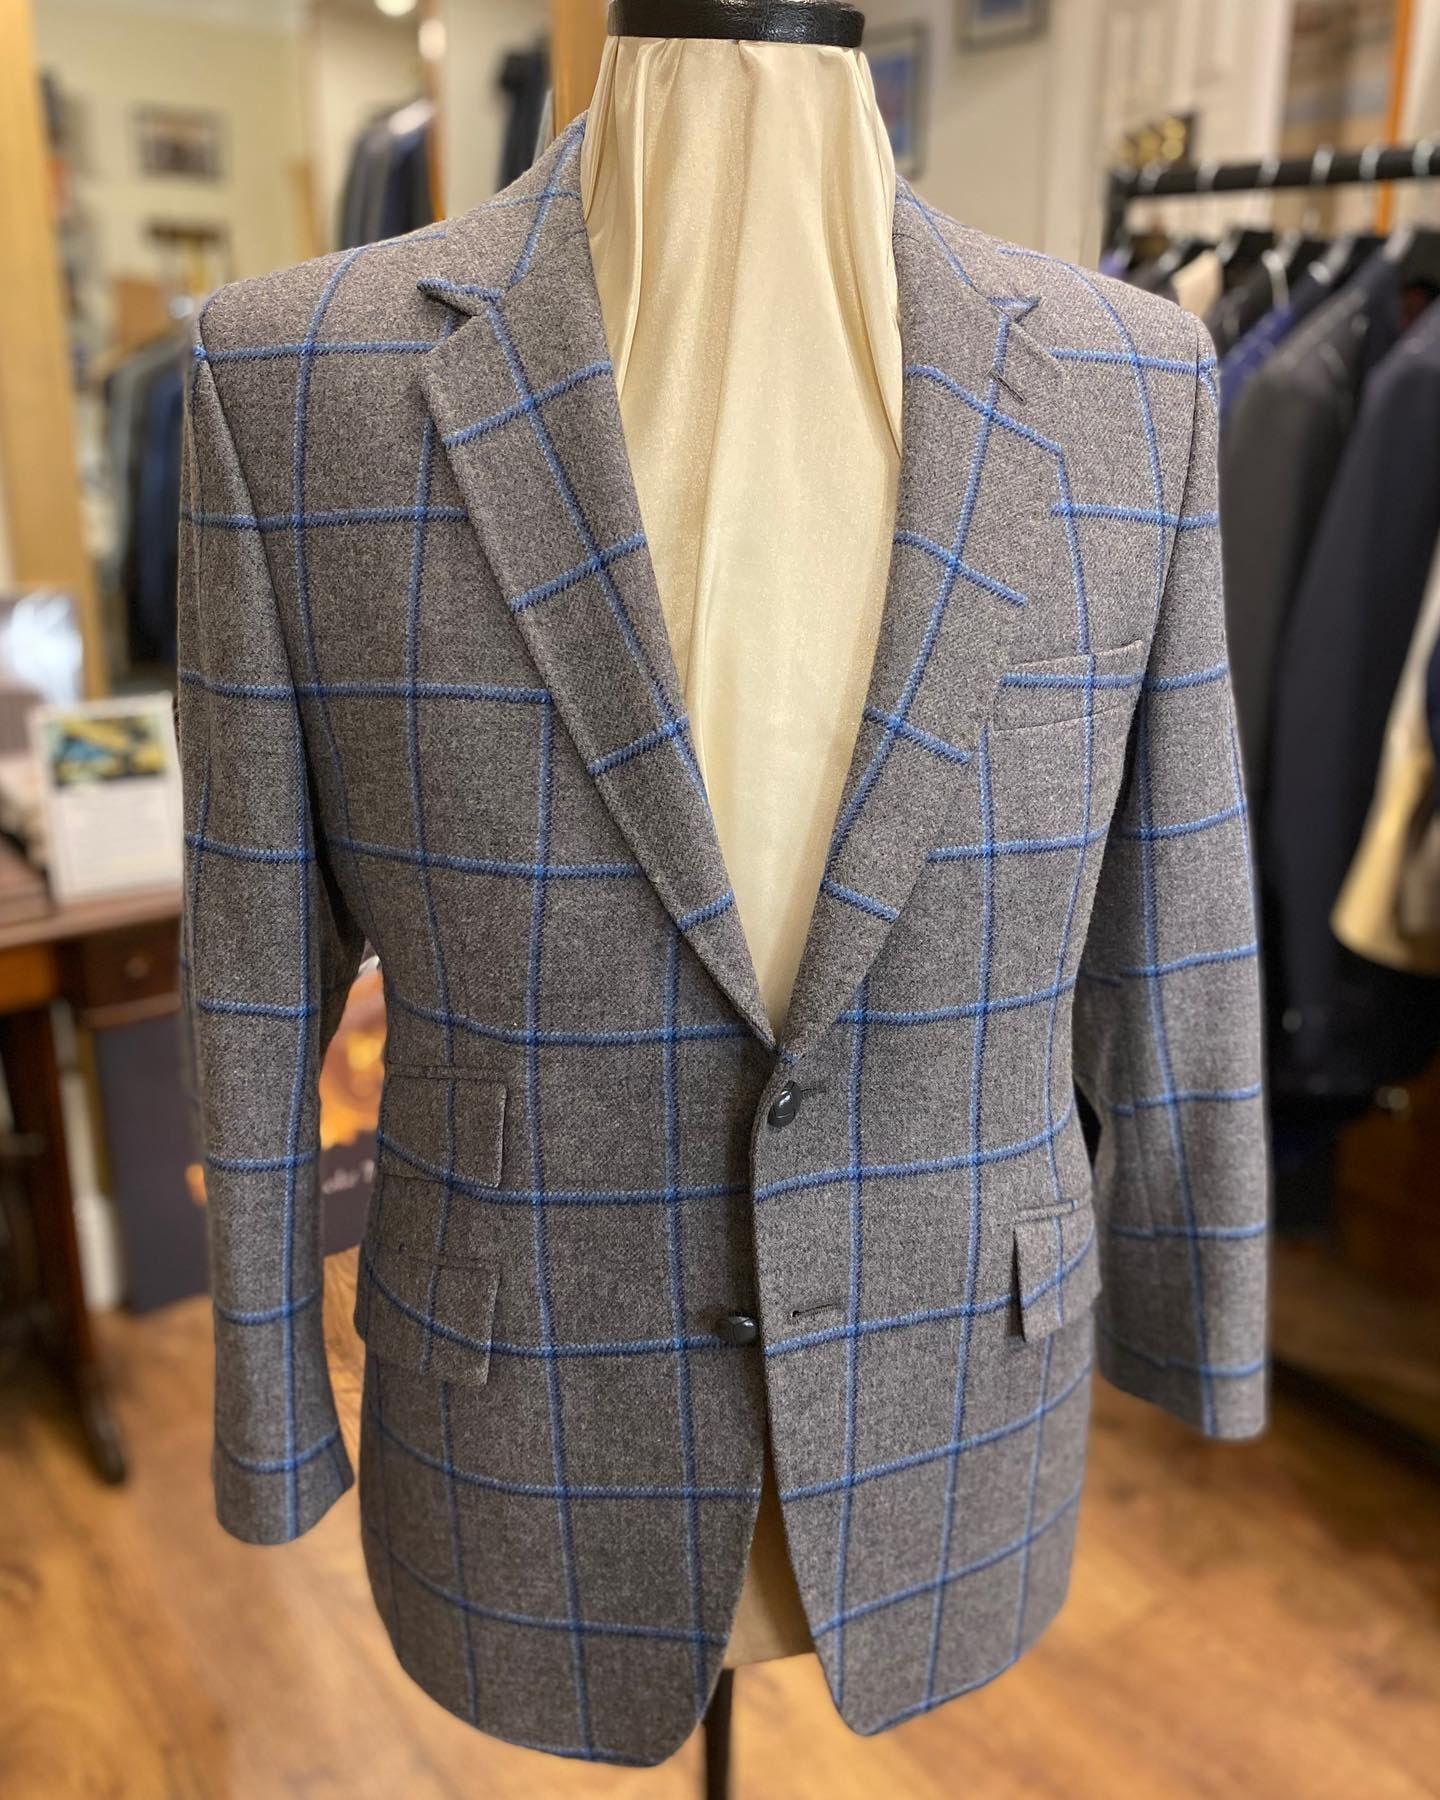 Bespoke Tweed Jacket in 2020 Suede elbow patches